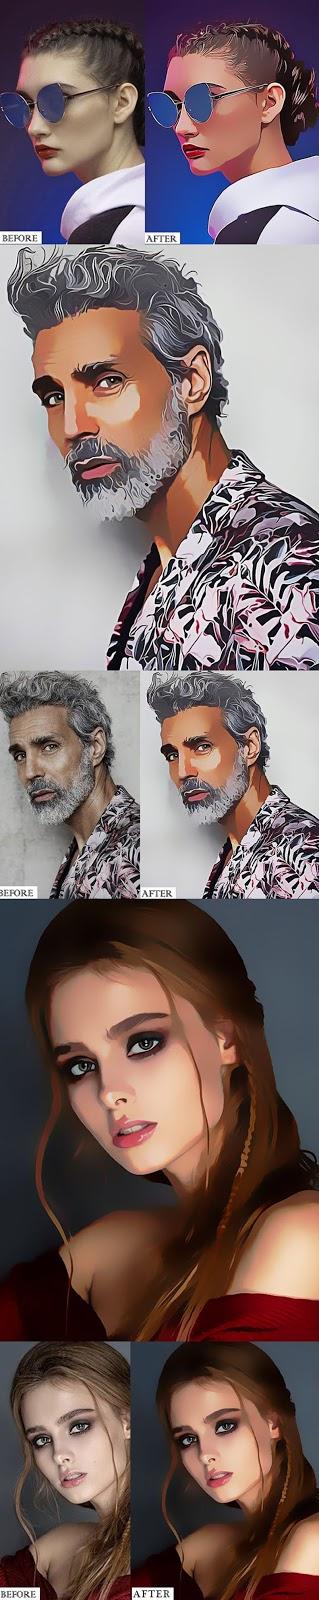 Magazine Art   Cartoon Painting Photoshop Action 26525951